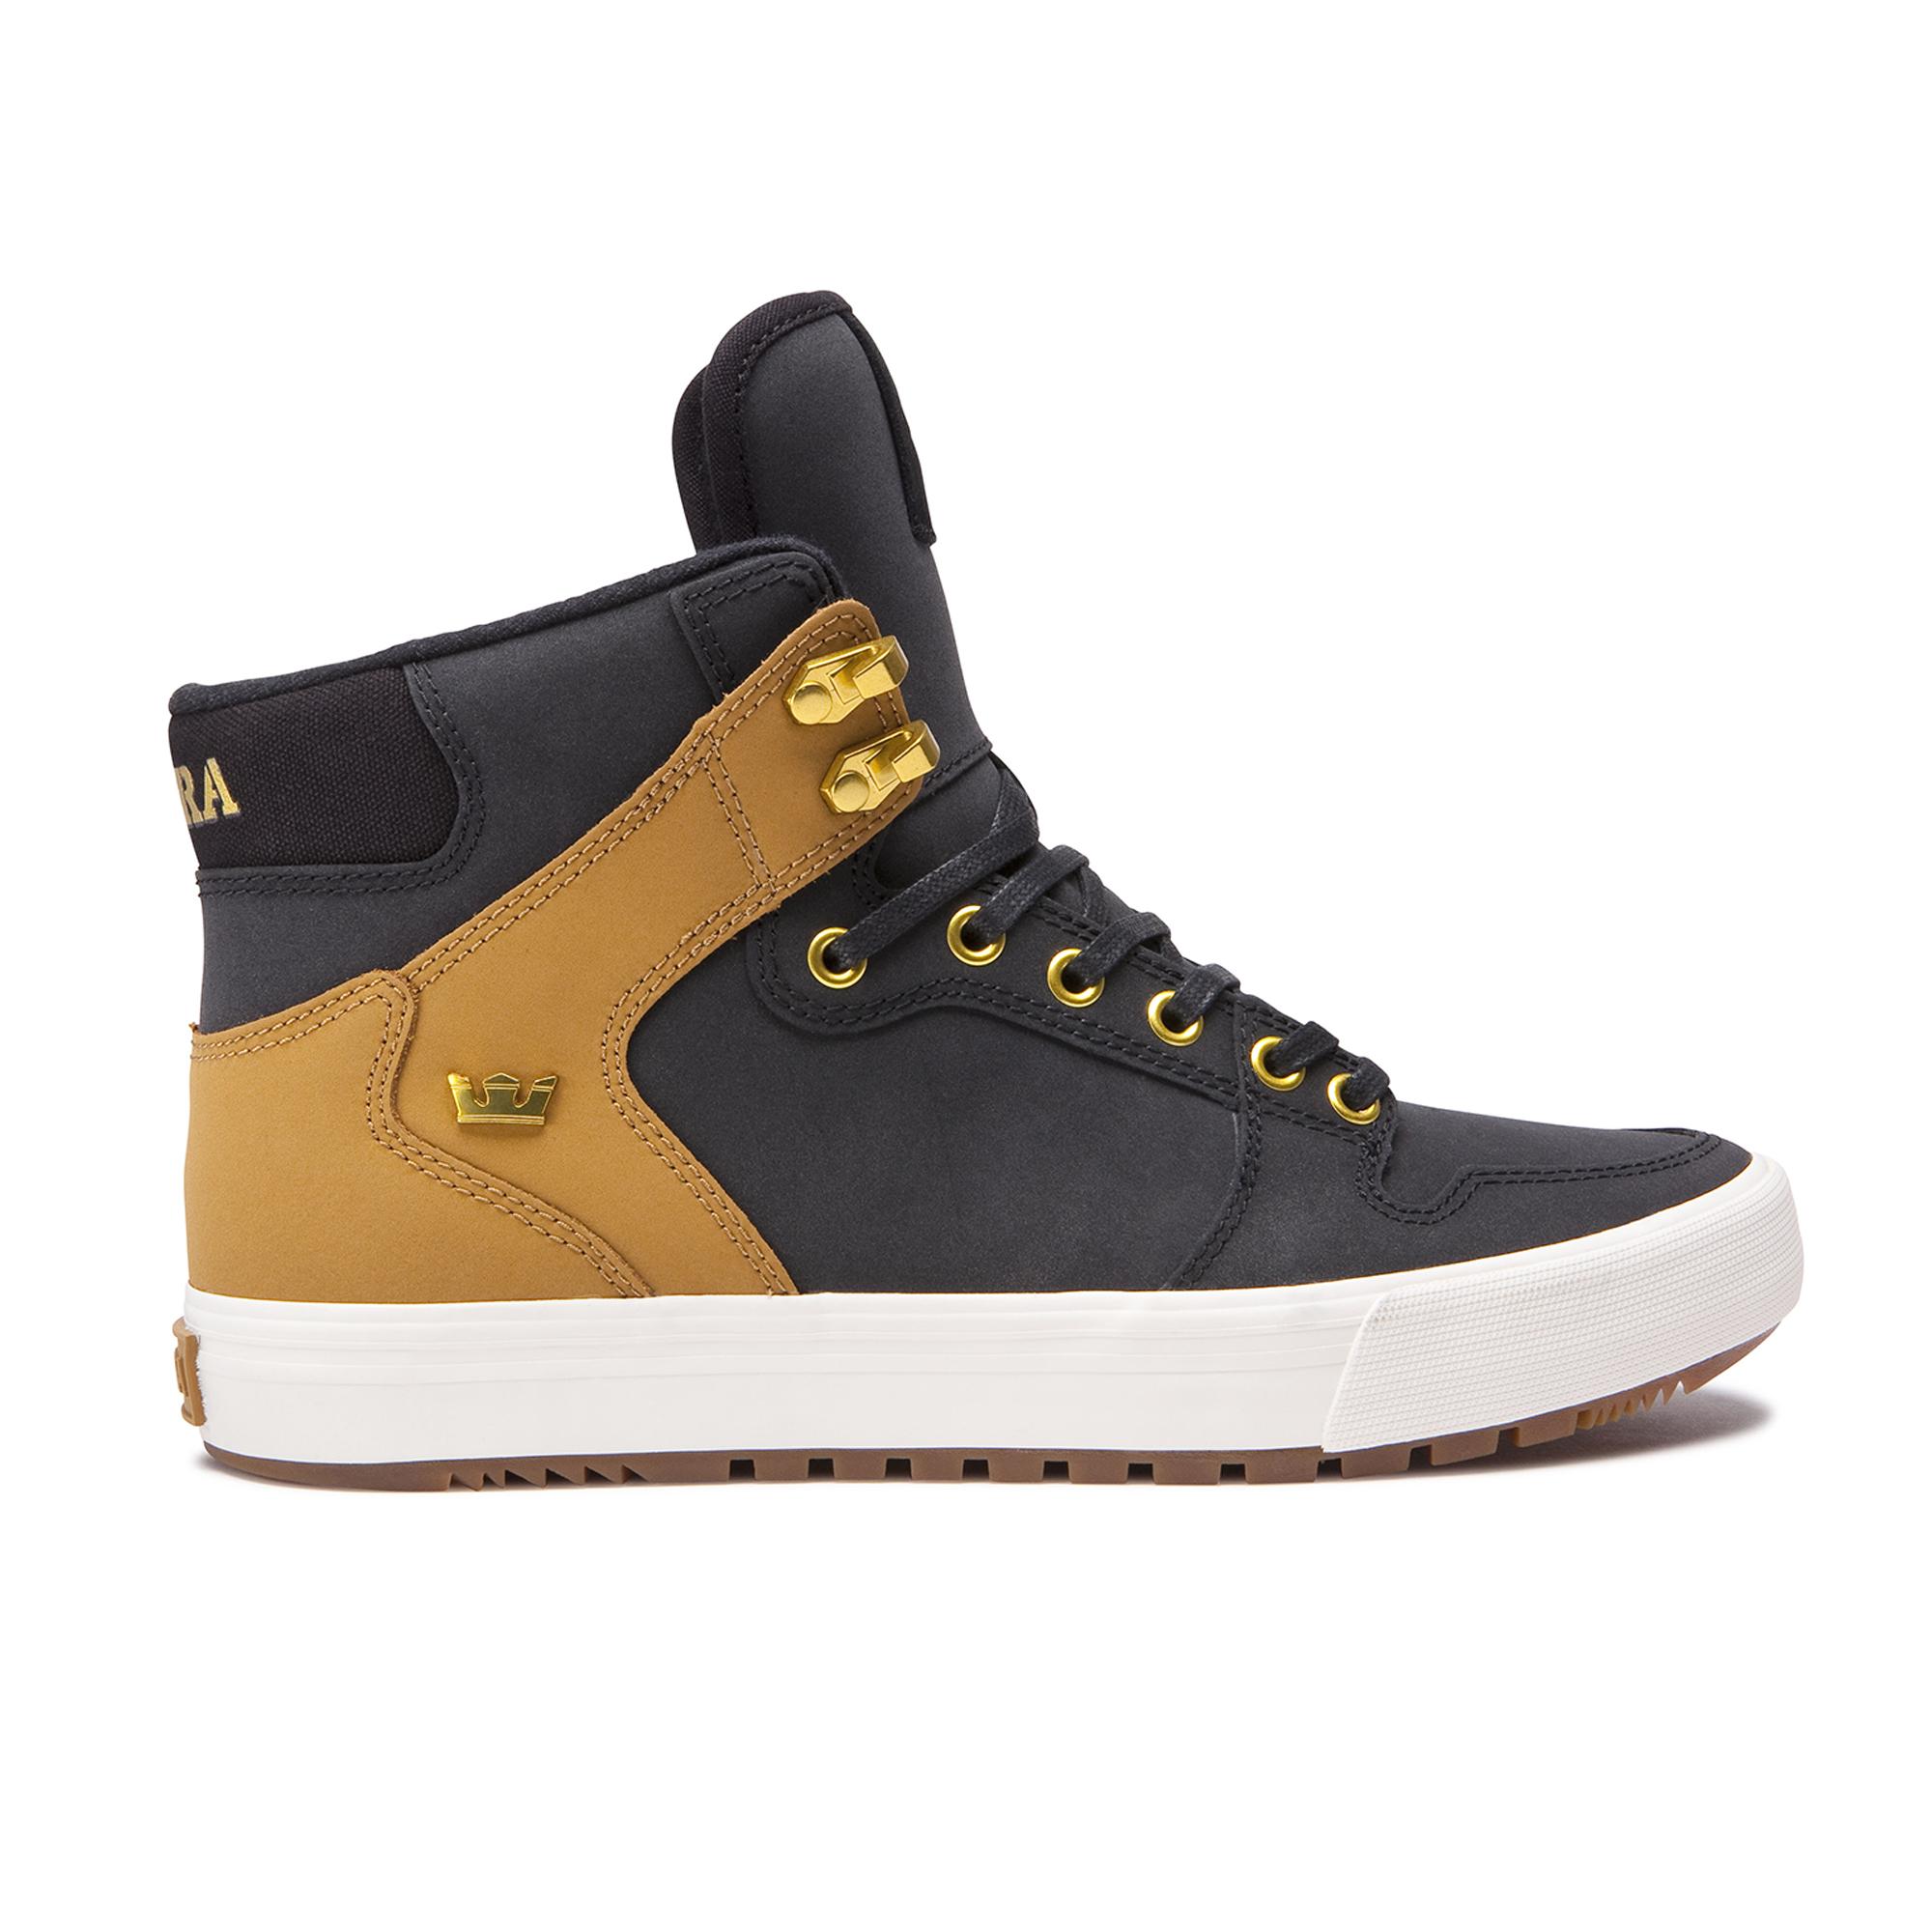 Supra Skateboard Shoes Vaider CW Black//Tan-Bone